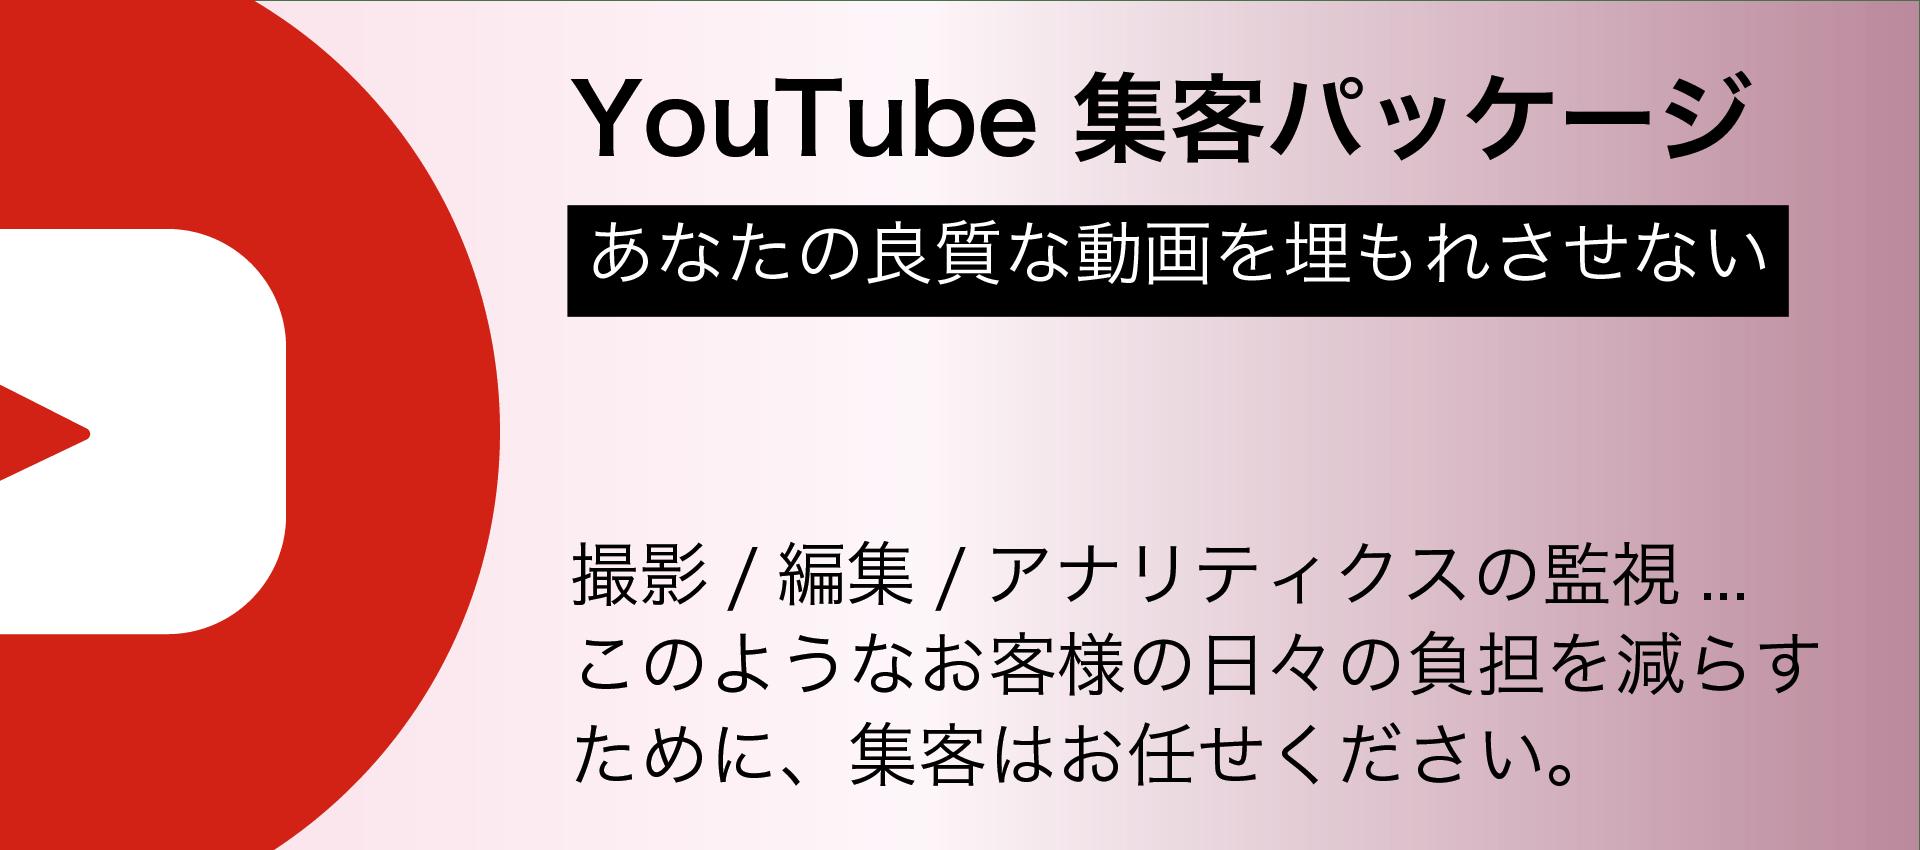 YouTube 集客パッケージ